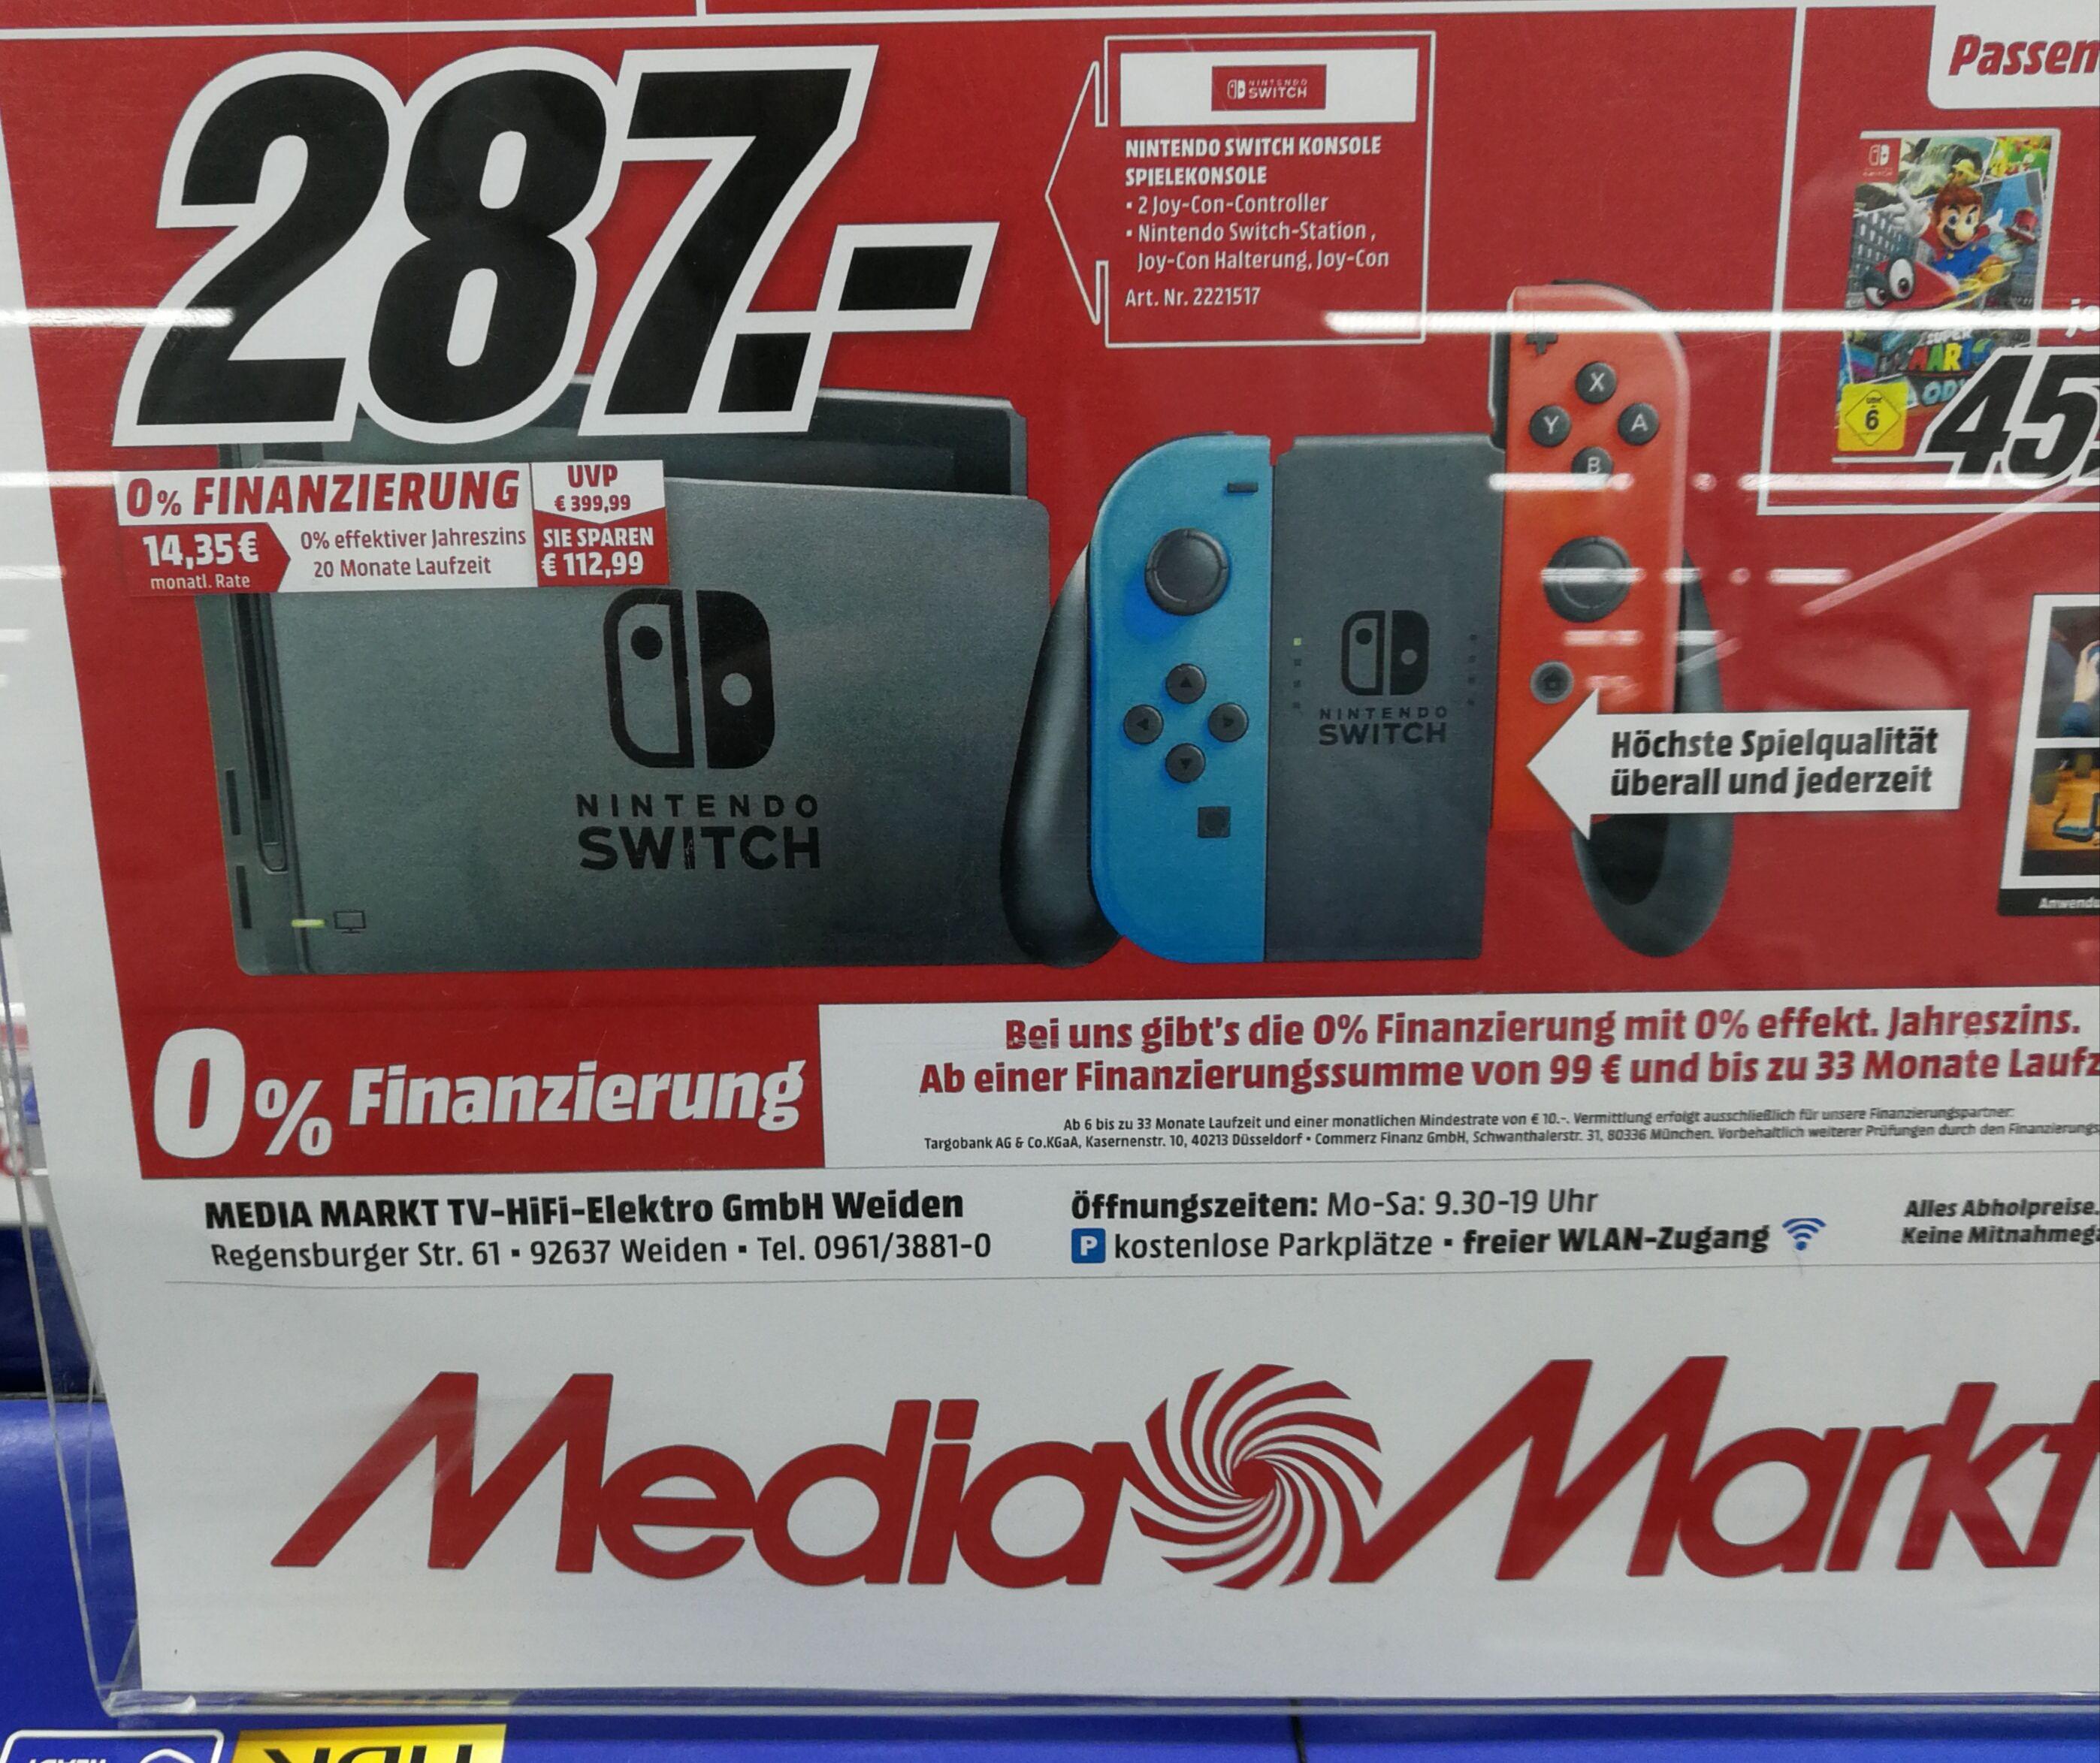 (LOKAL) Media Markt Weiden / Nintendo Switch Neon